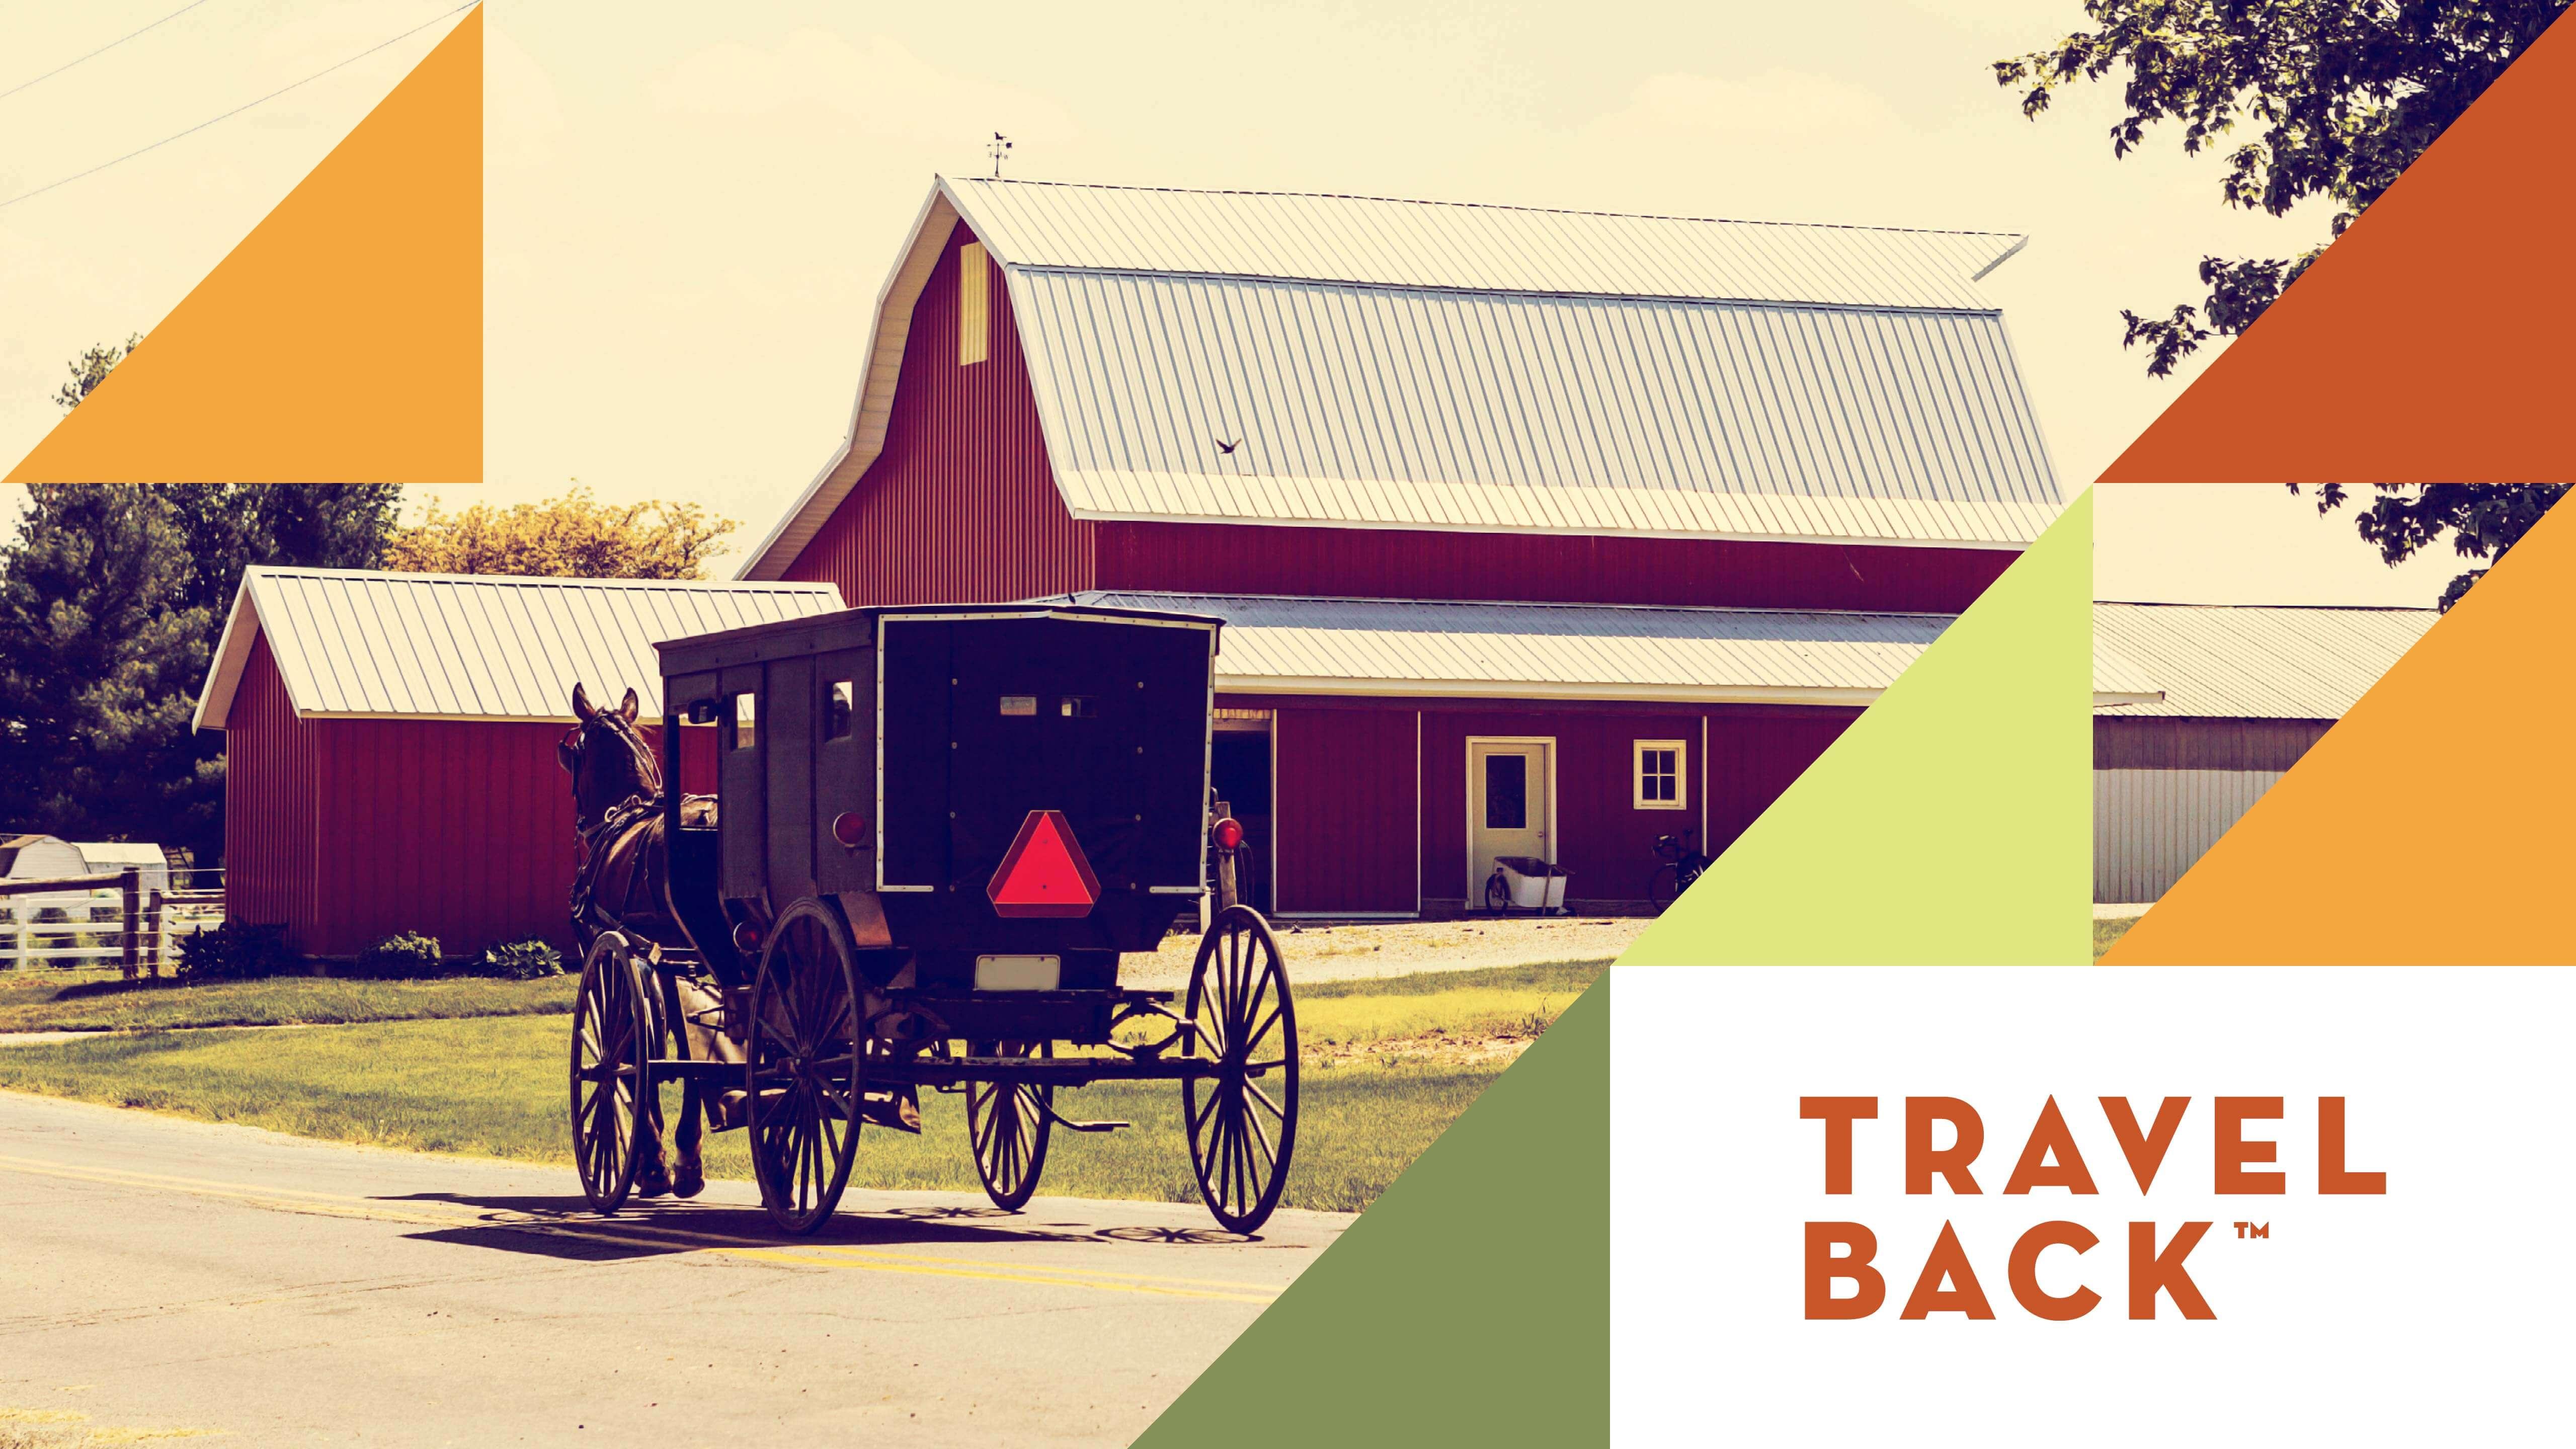 Amish Country of Illinois Branding - Tuscola